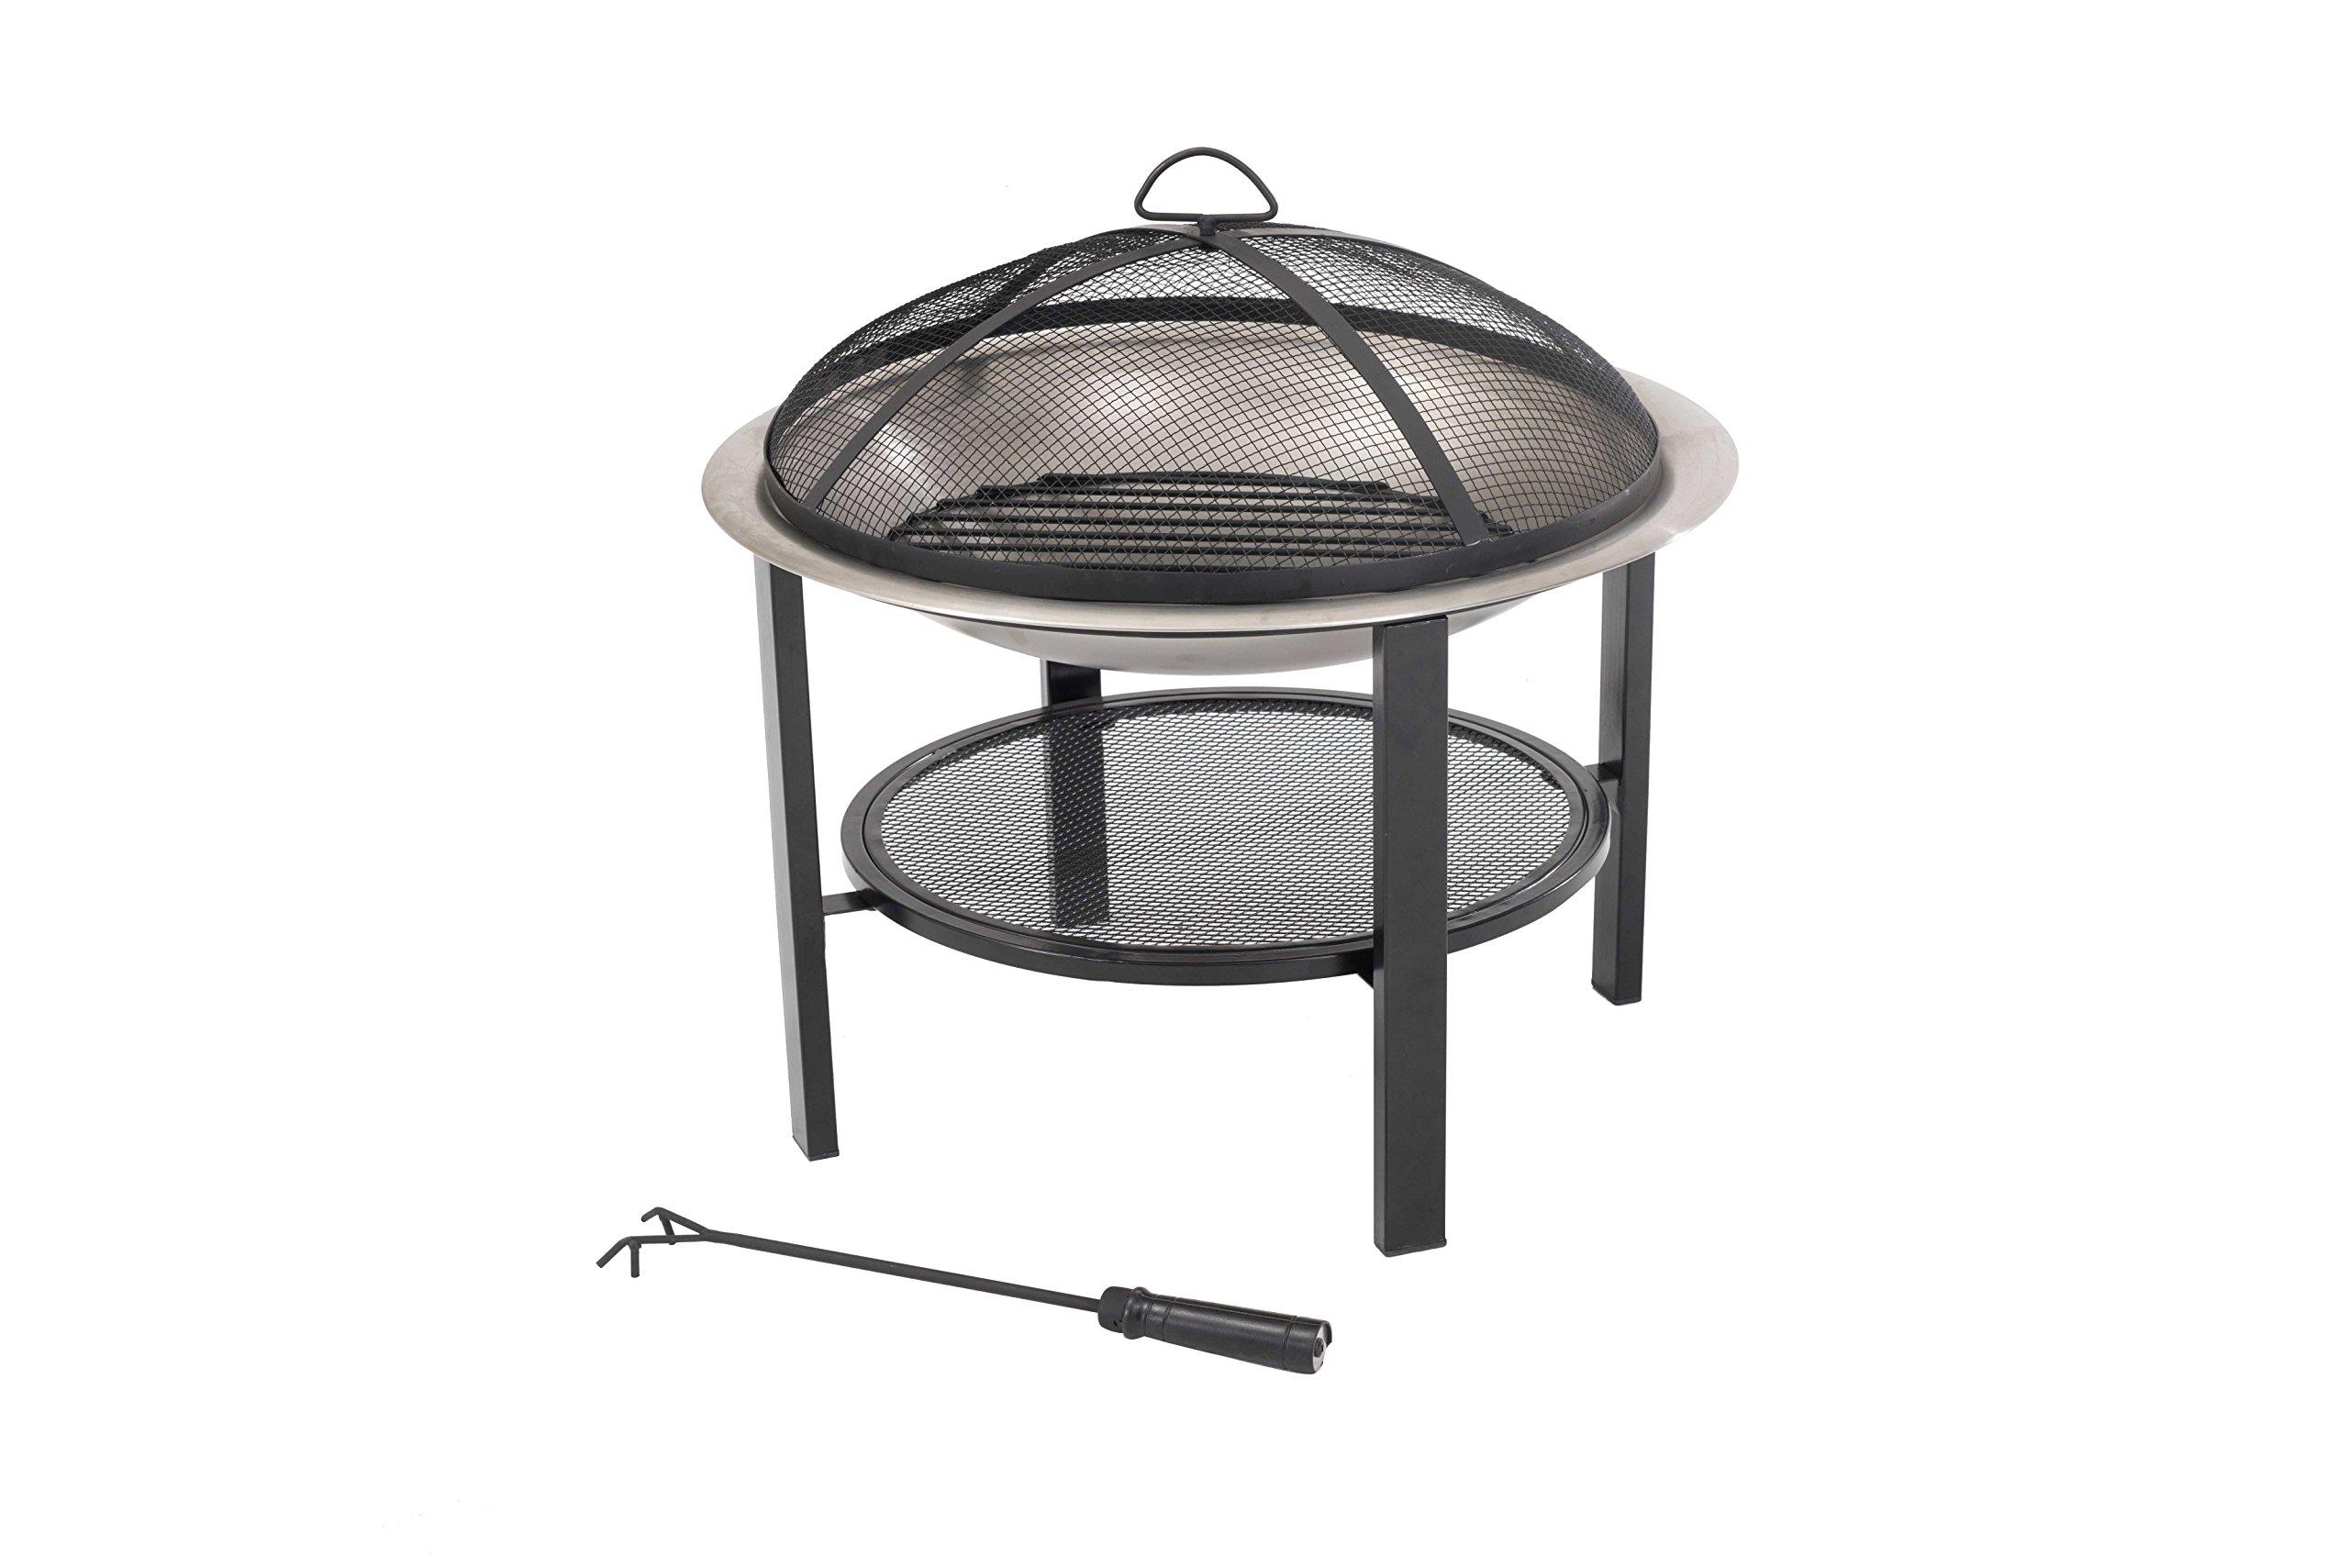 Sunjoy 26'' Verde Stainless Steel Fire Pit